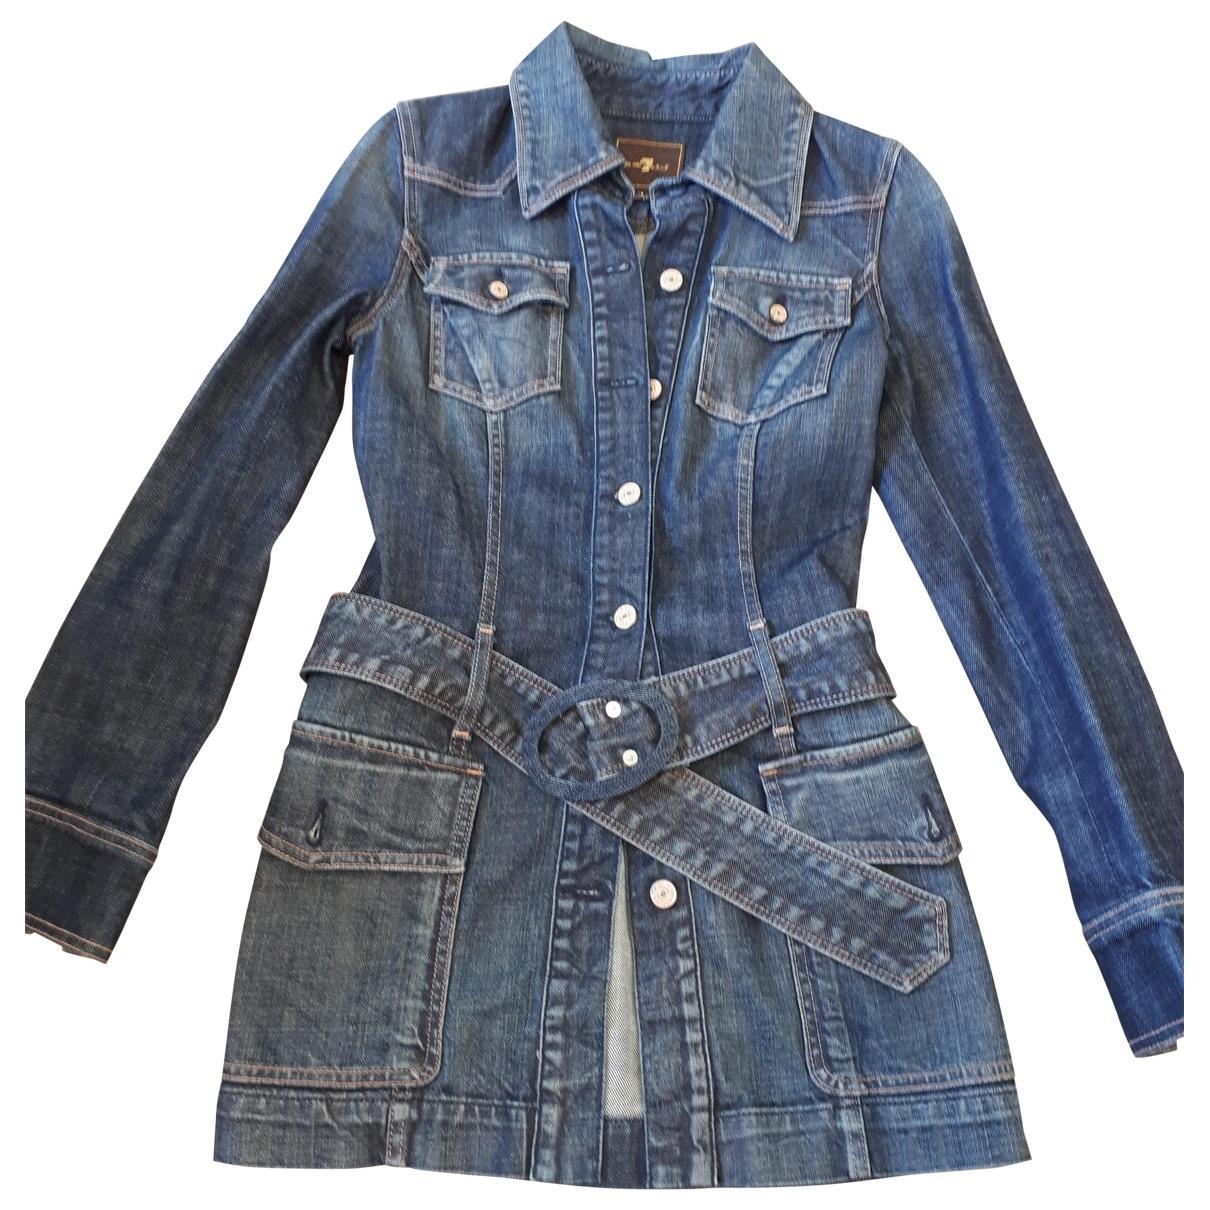 7 For All Mankind \N Blue Denim - Jeans jacket for Women S International